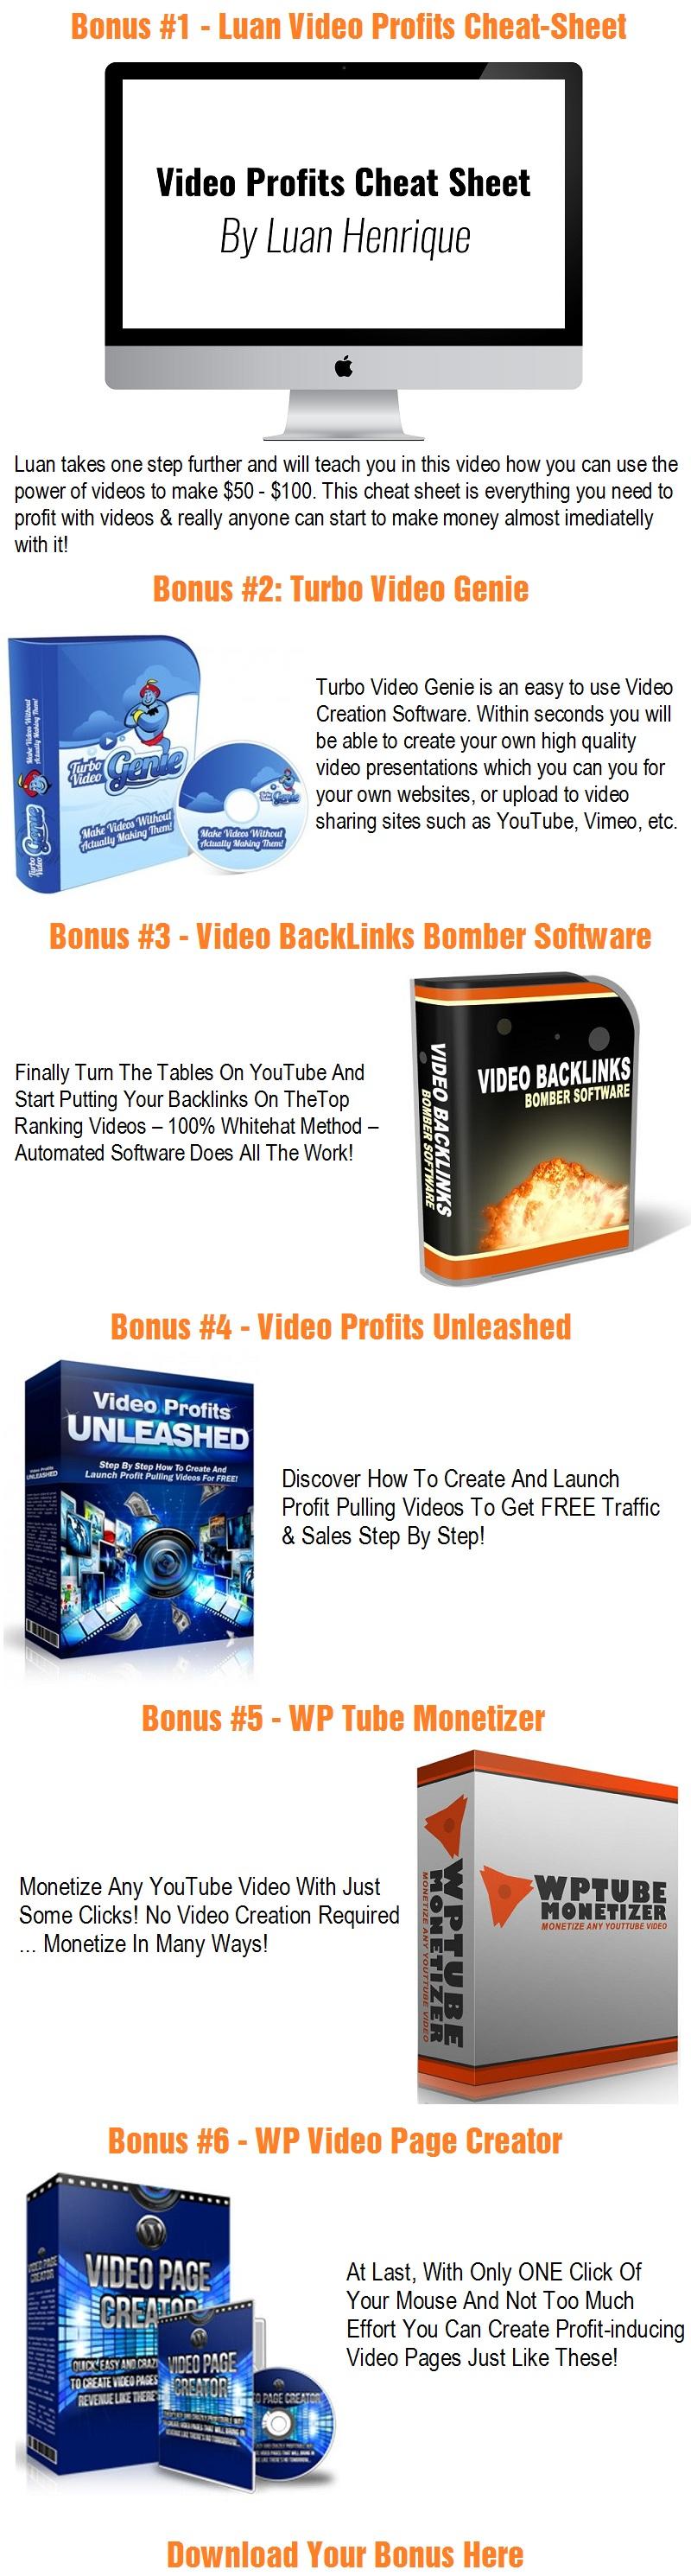 Video Express Bonus